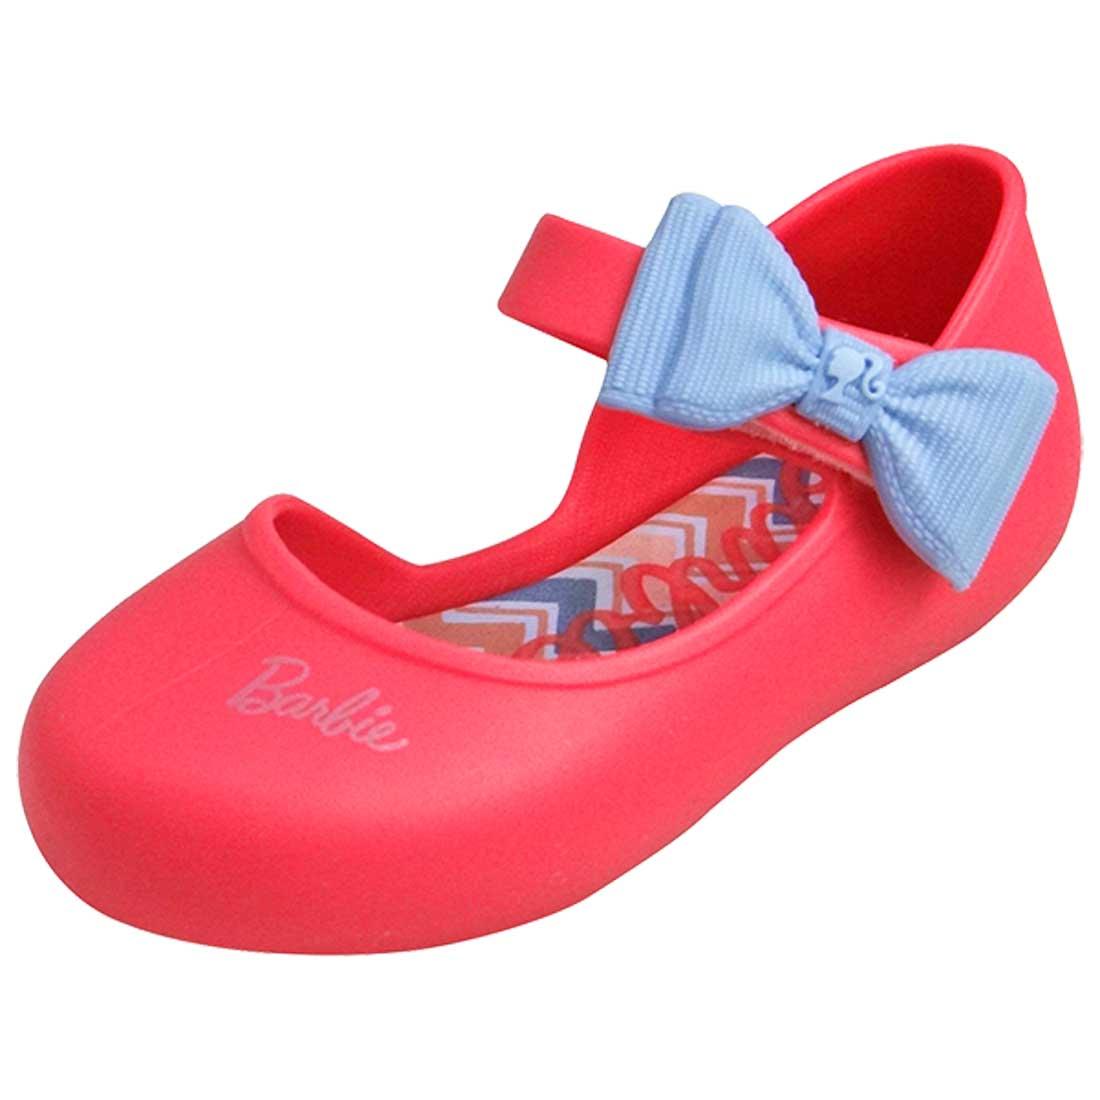 Sapatilha Boneca Baby Barbie Happy - Rosa